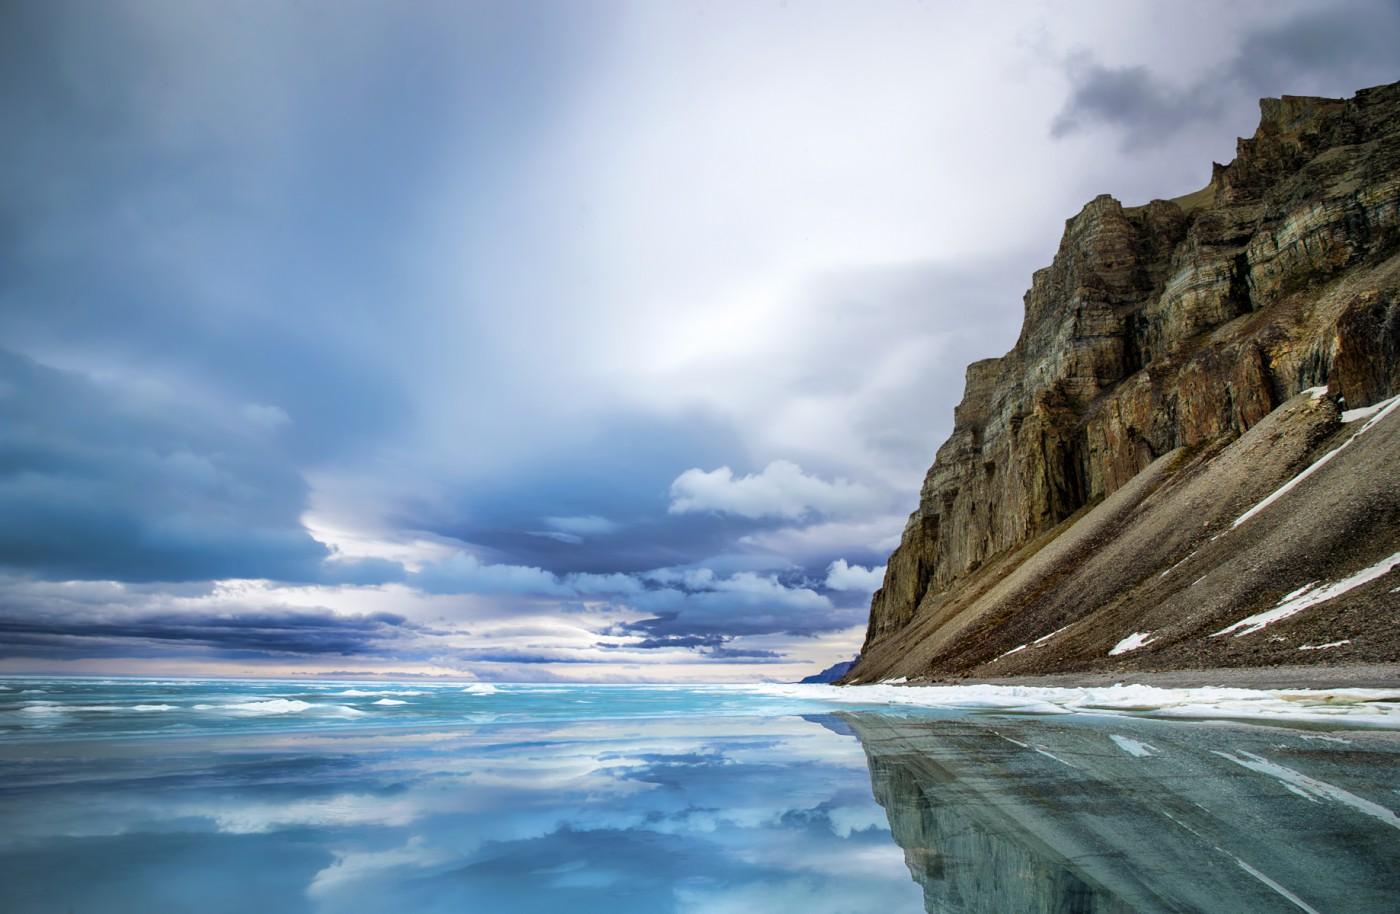 Michelle Valberg, </span><span><em>Arctic Bay</em>